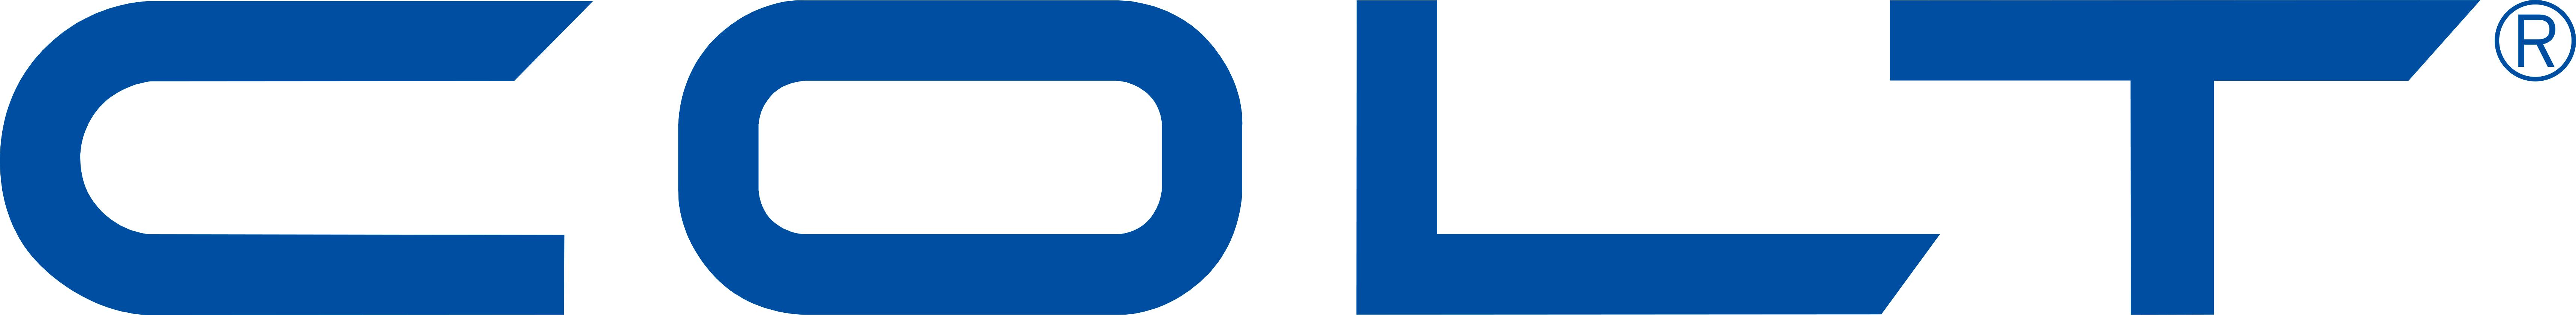 Logo Colt 100 LSA